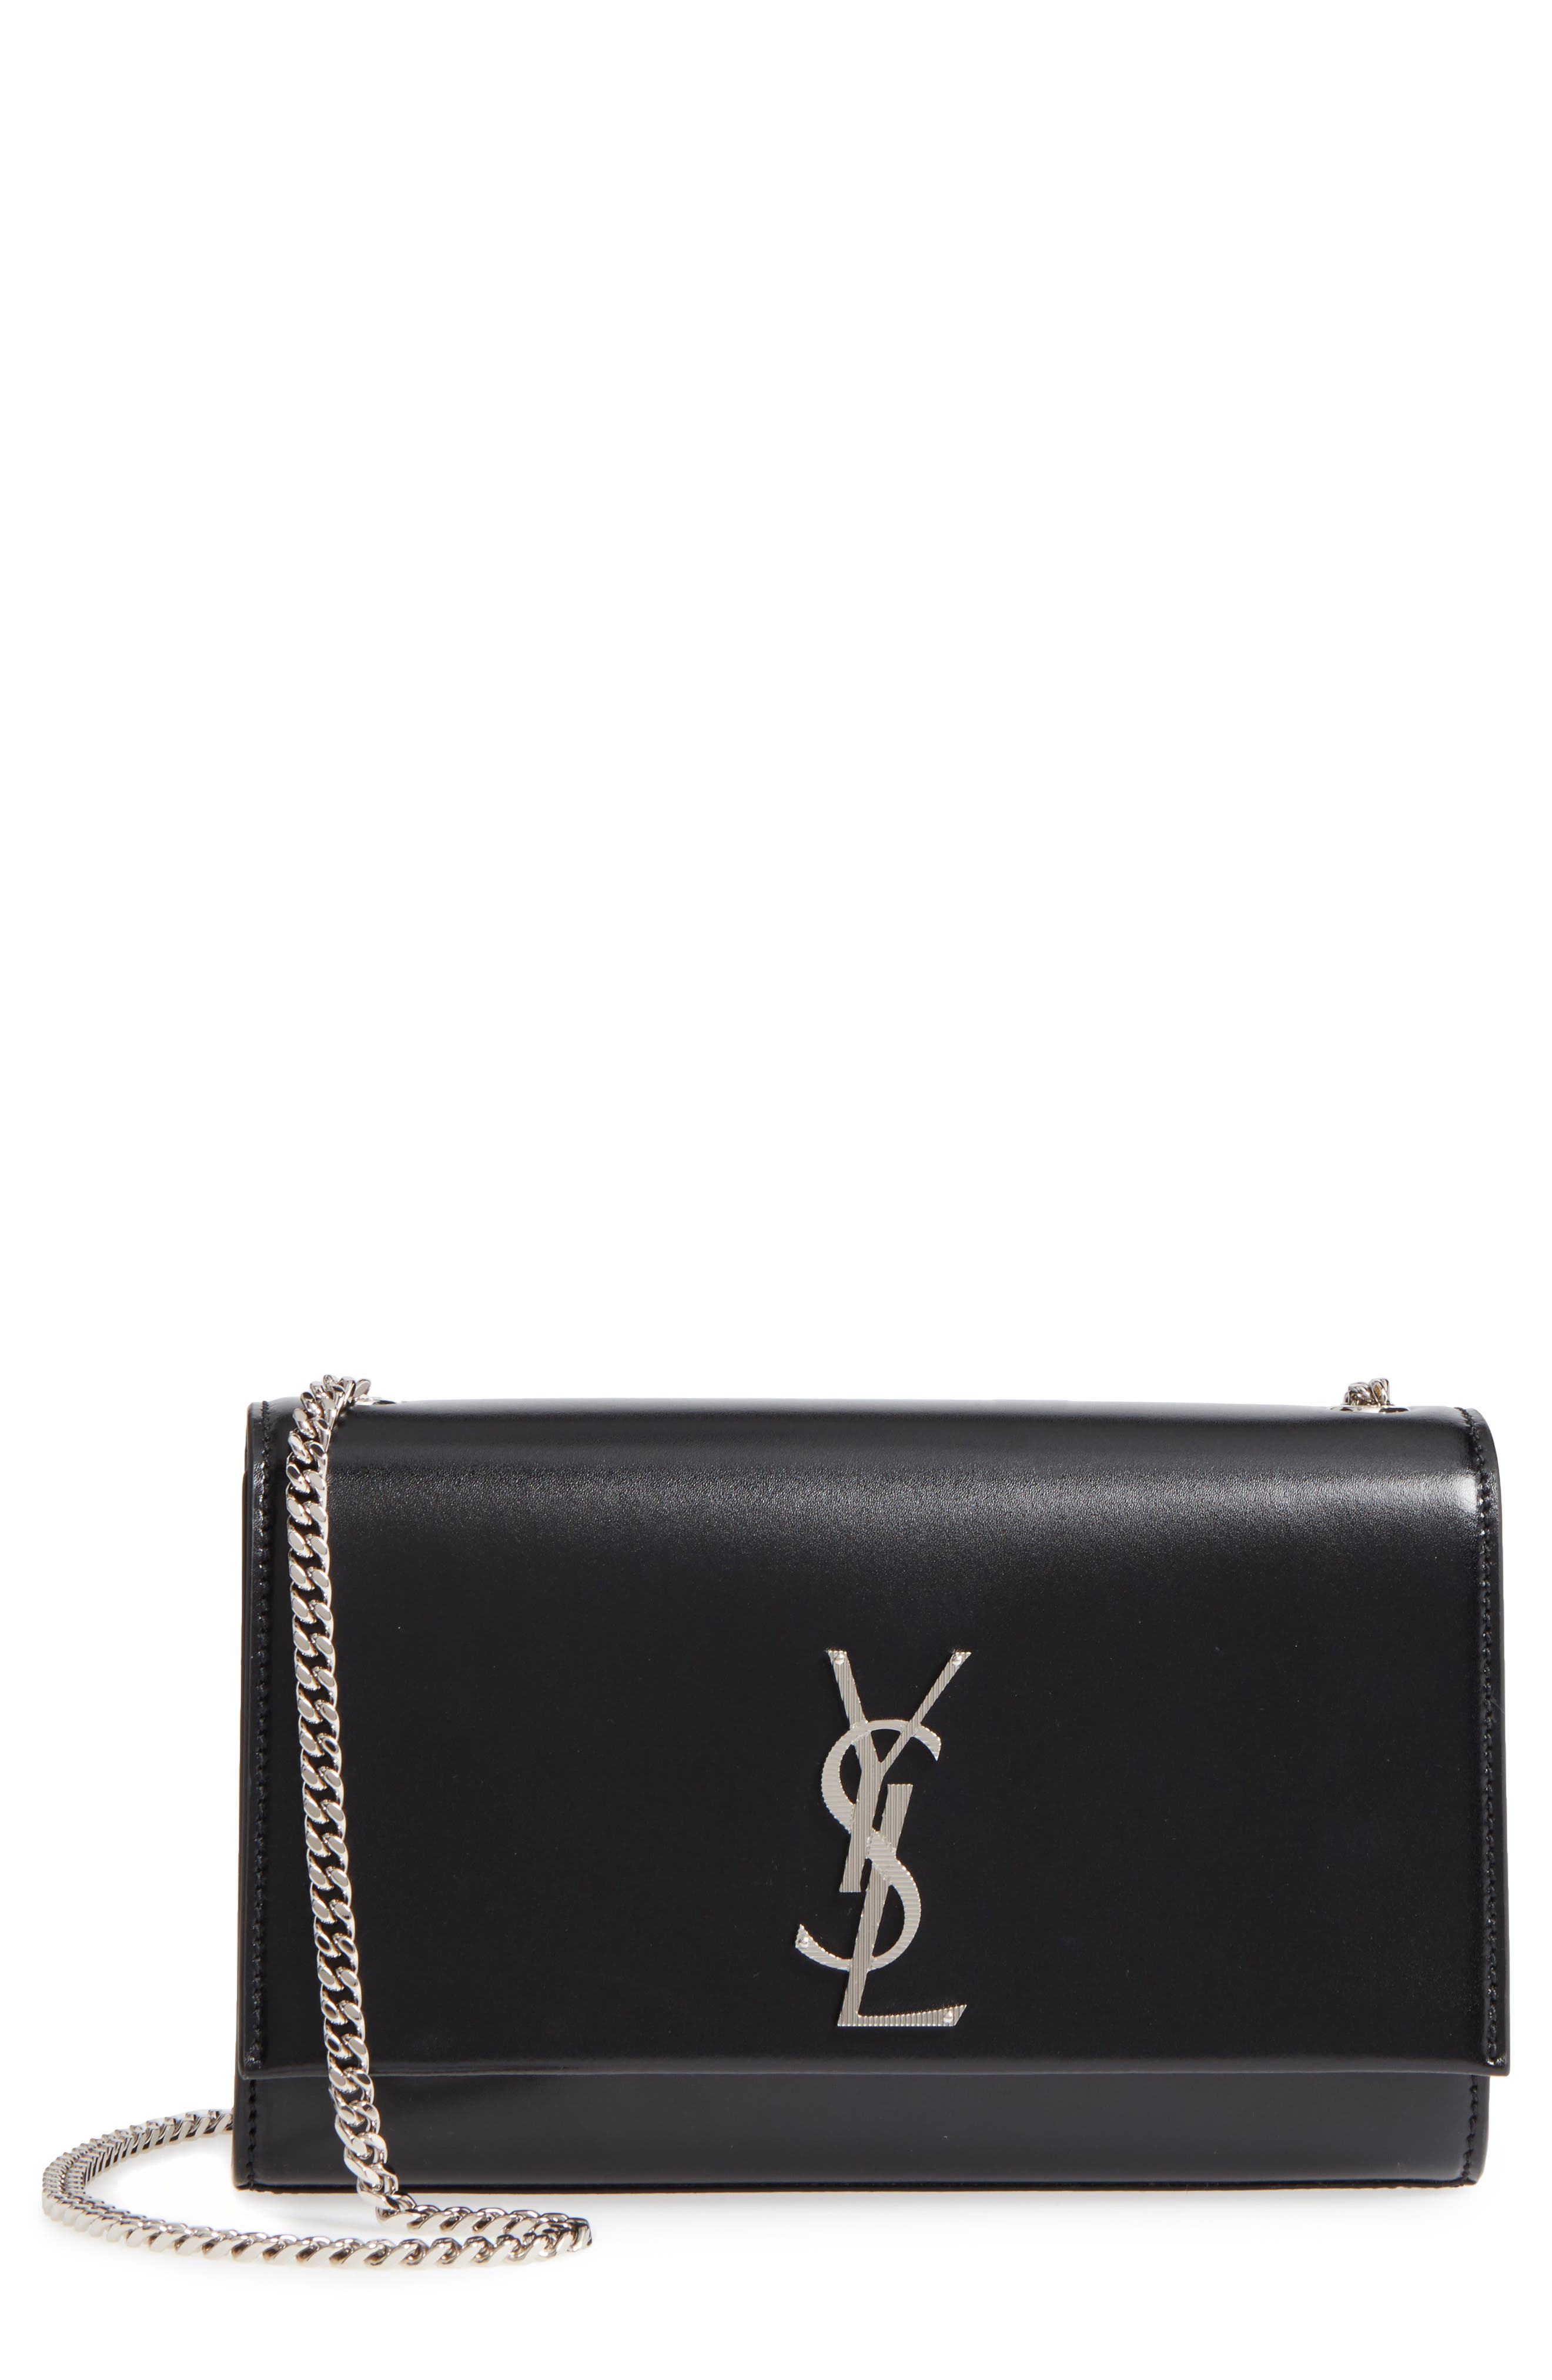 Medium Kate Calfskin Leather Crossbody Bag,                             Main thumbnail 1, color,                             Noir